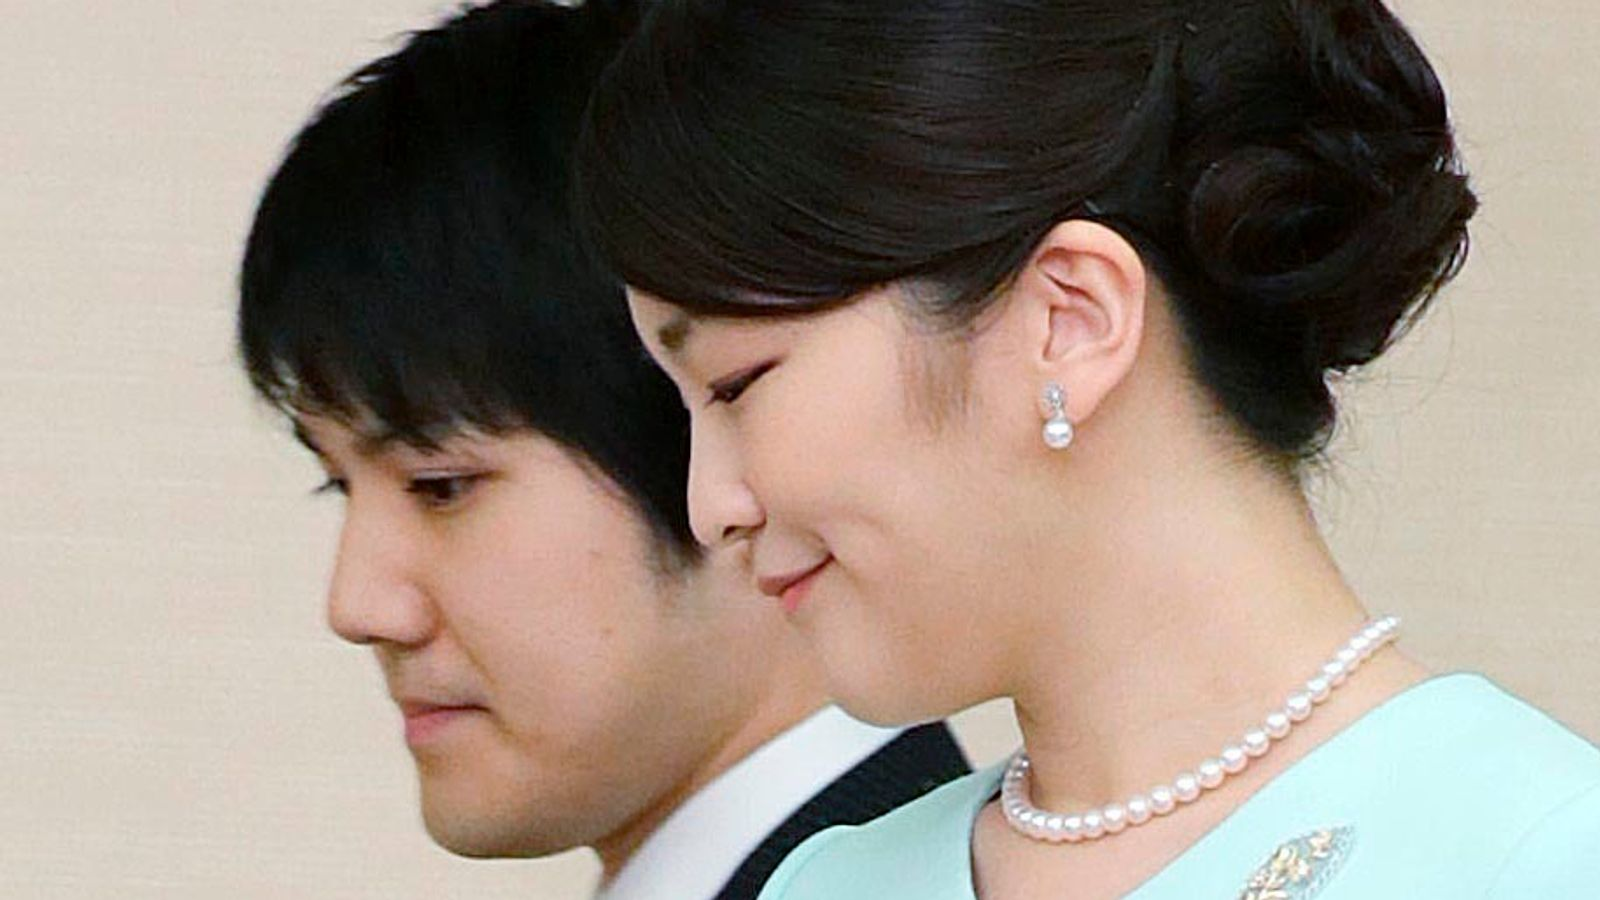 Japan's Princess Mako loses royal status after marrying commoner boyfriend